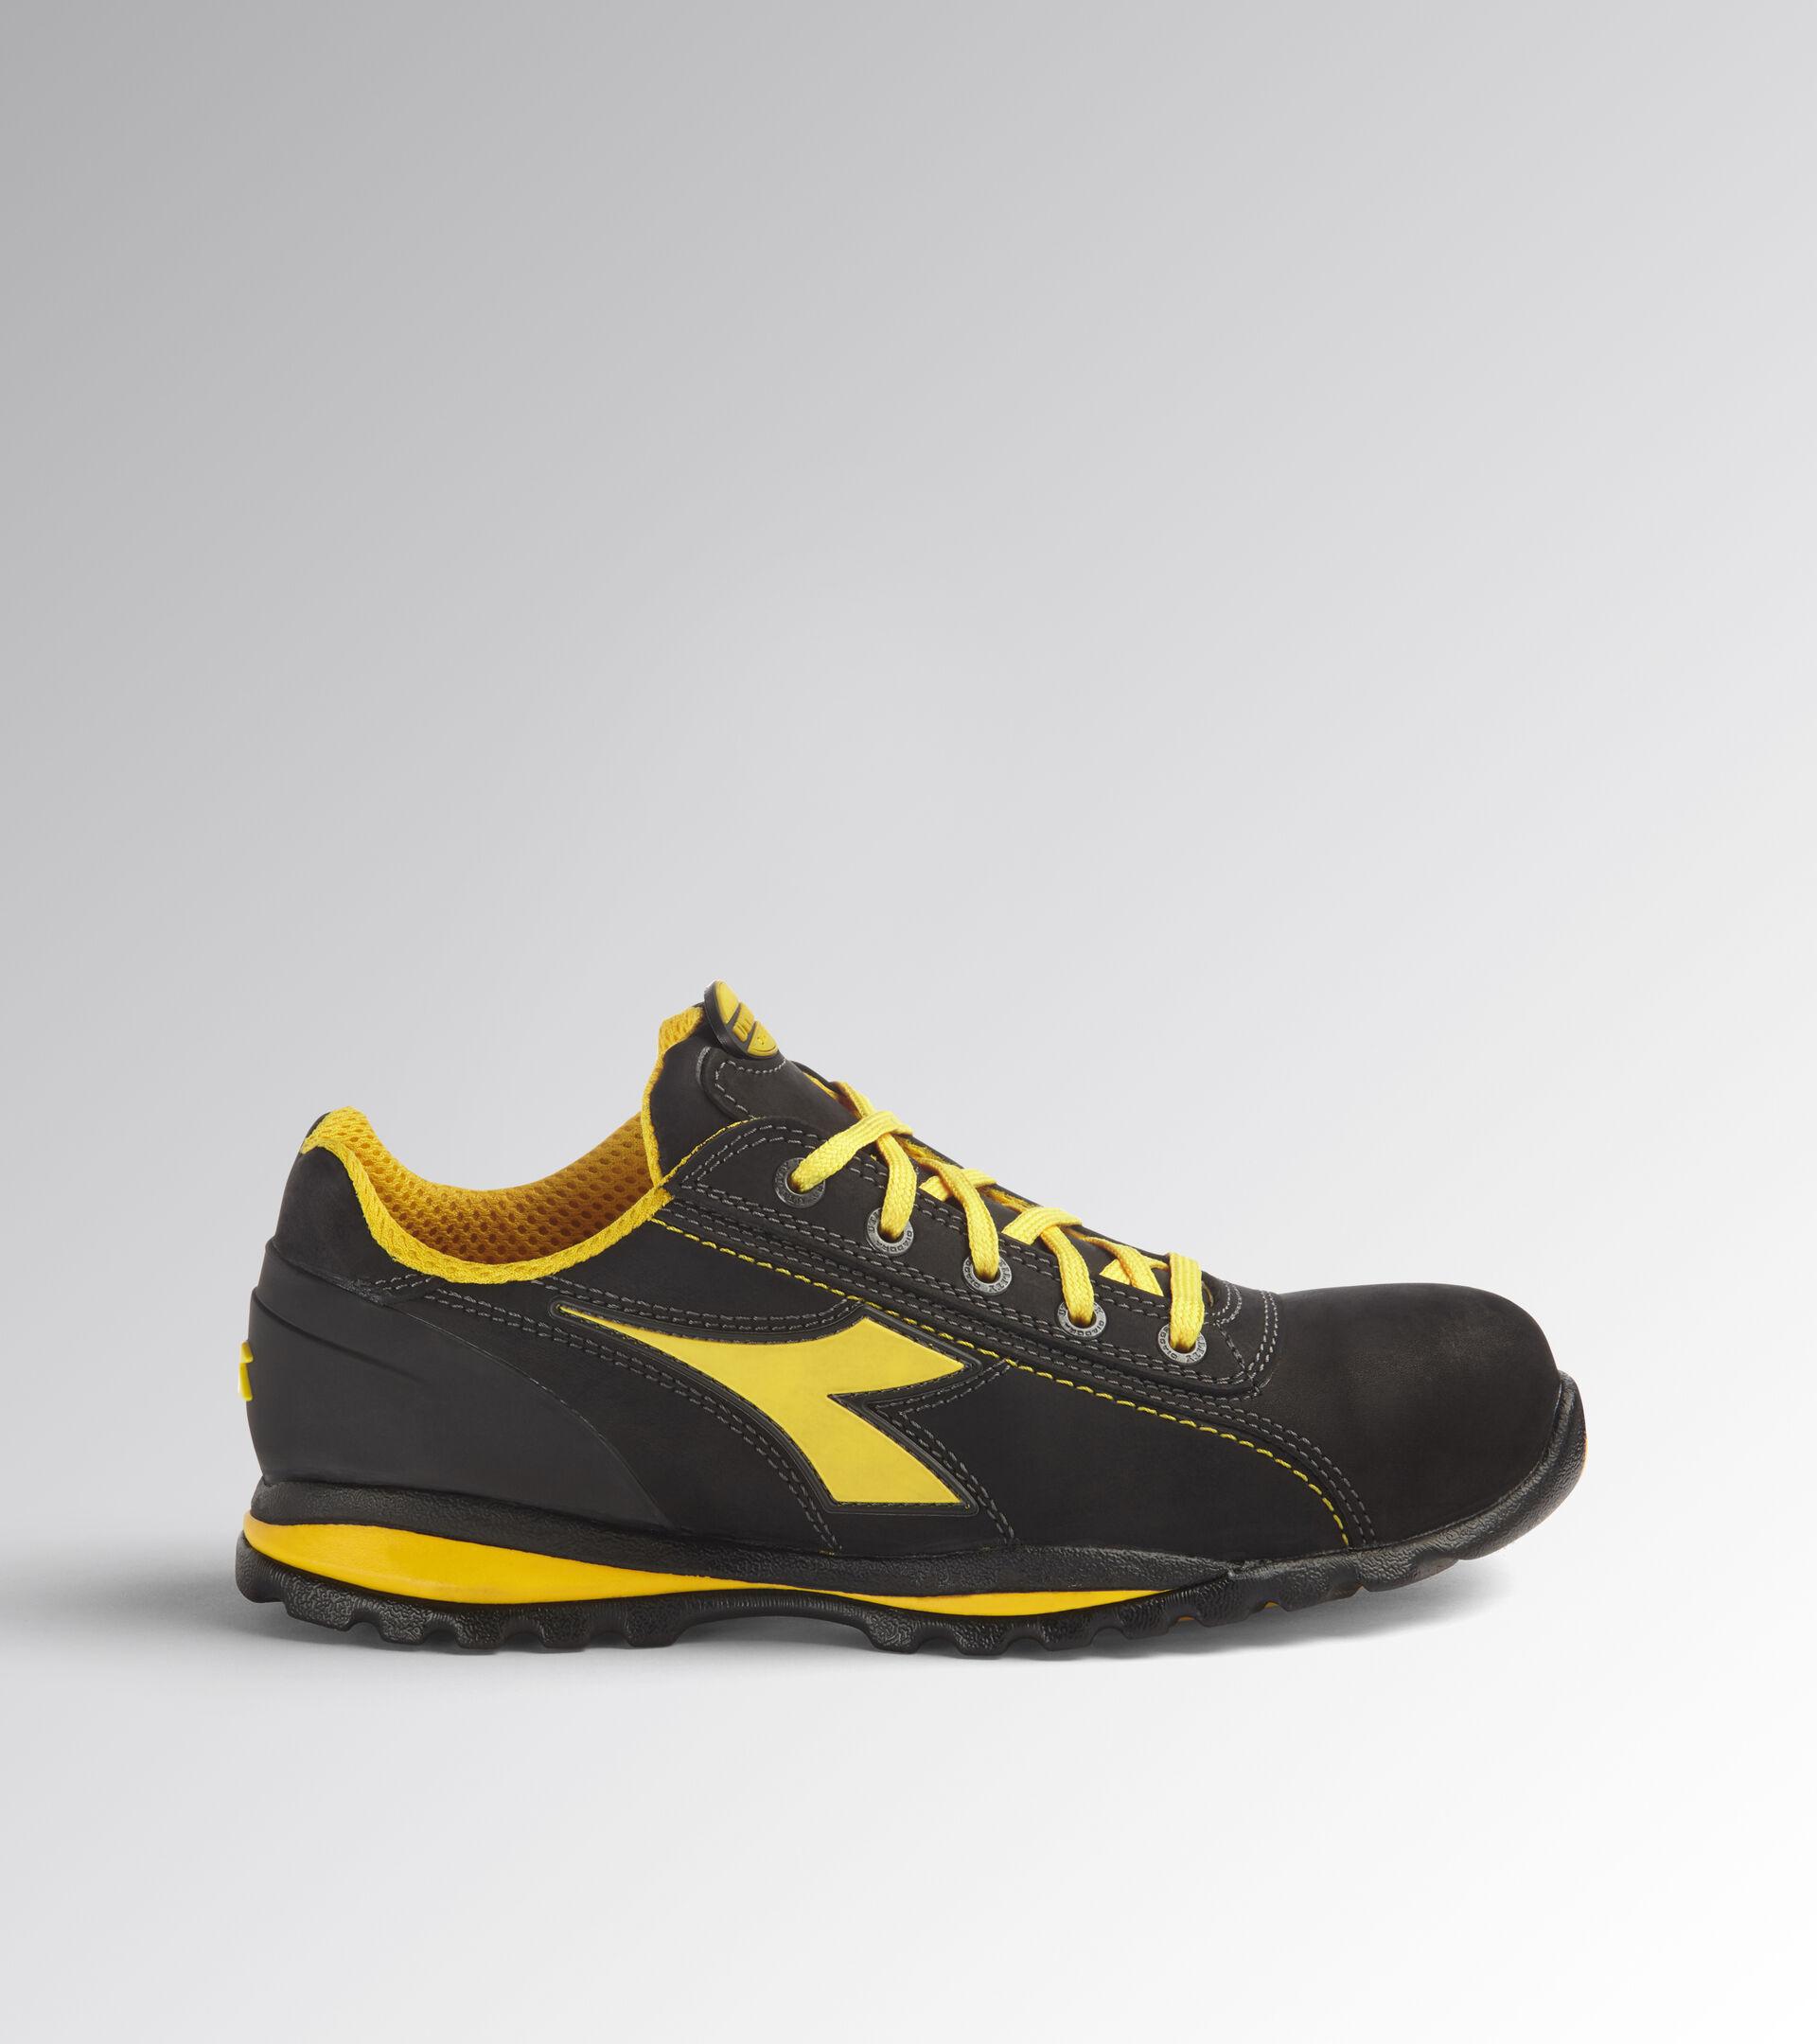 Footwear Utility UNISEX GLOVE LOW S3 HRO SRA SCHWARZ Utility